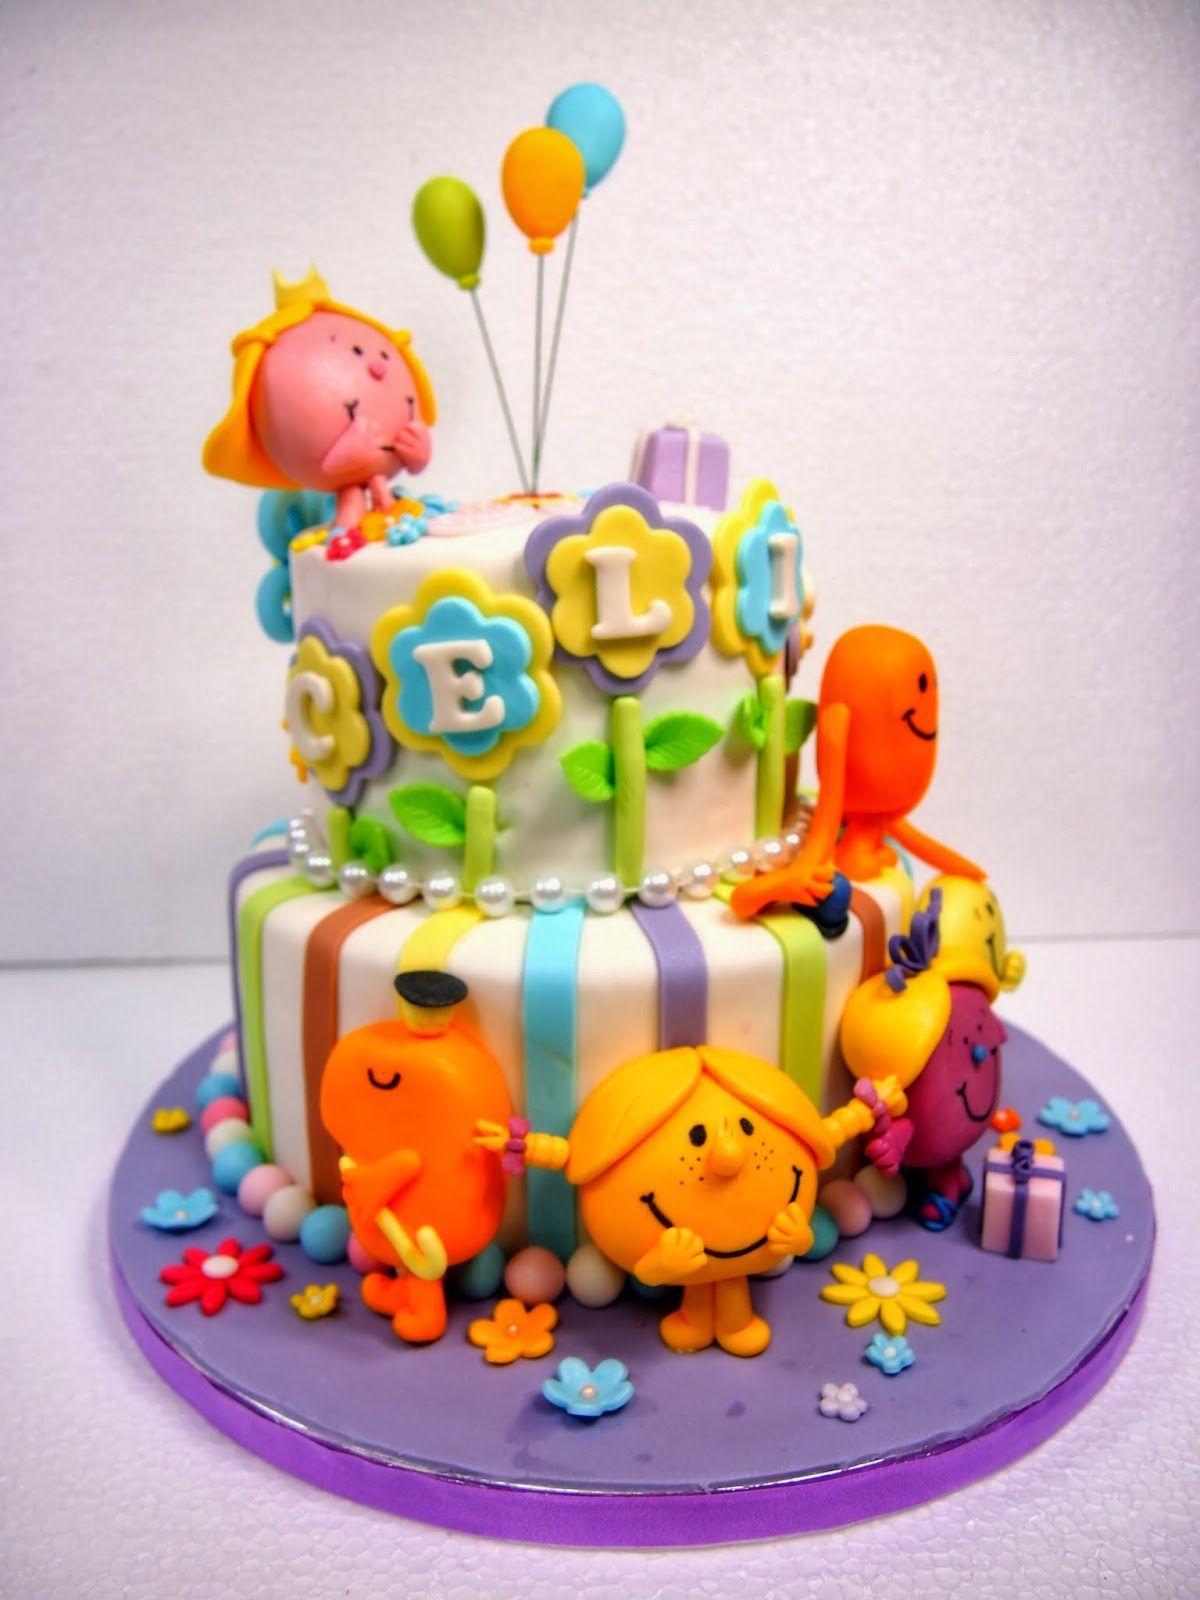 Mr Men And Little Miss Cakes A Lot Of Modeling MrMen - Little miss birthday cake